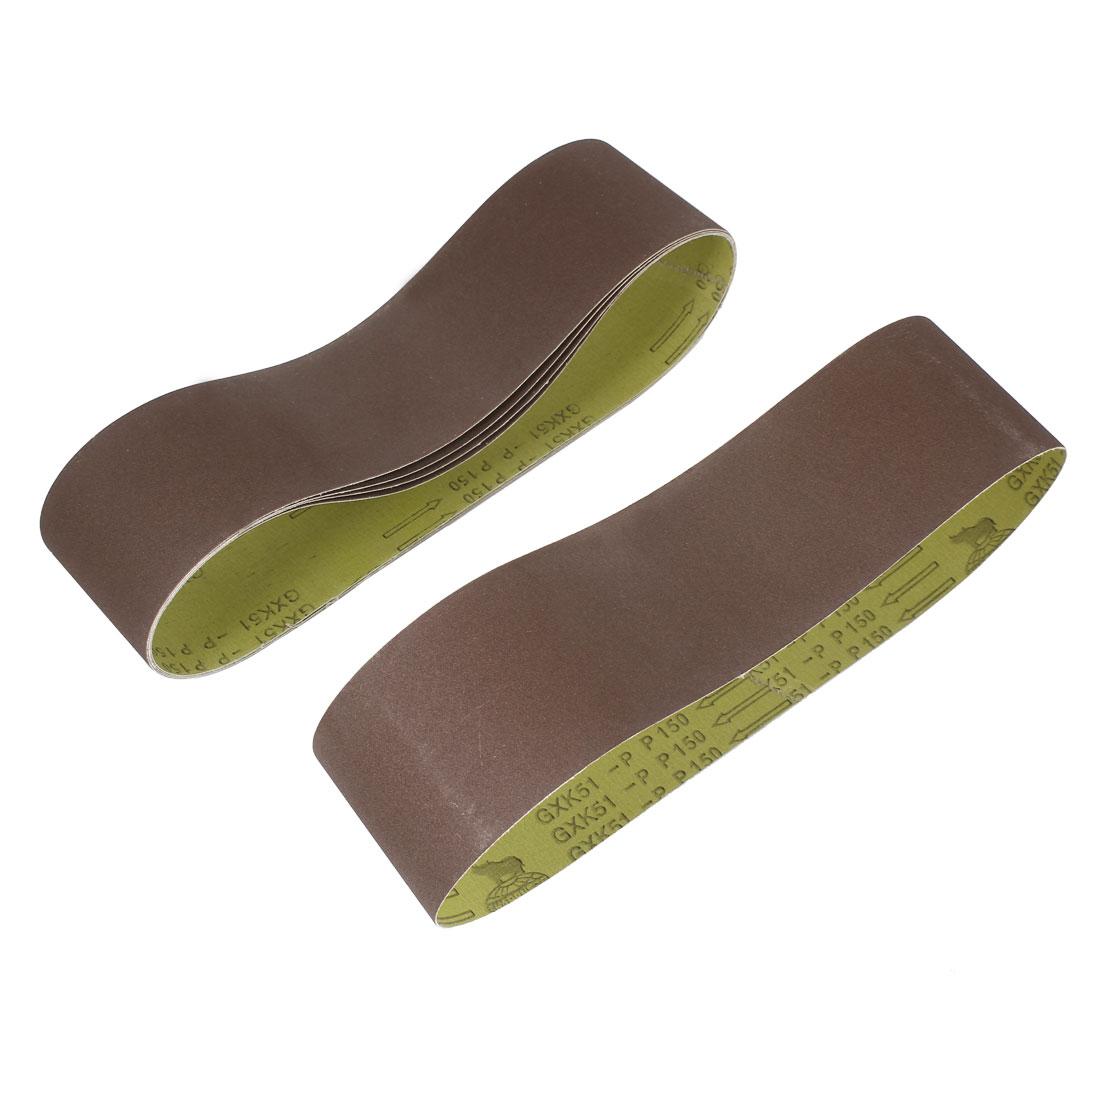 Woodworking 915mmx100mm 150 Grit Abrasive Sanding Belt Sandpaper 5pcs